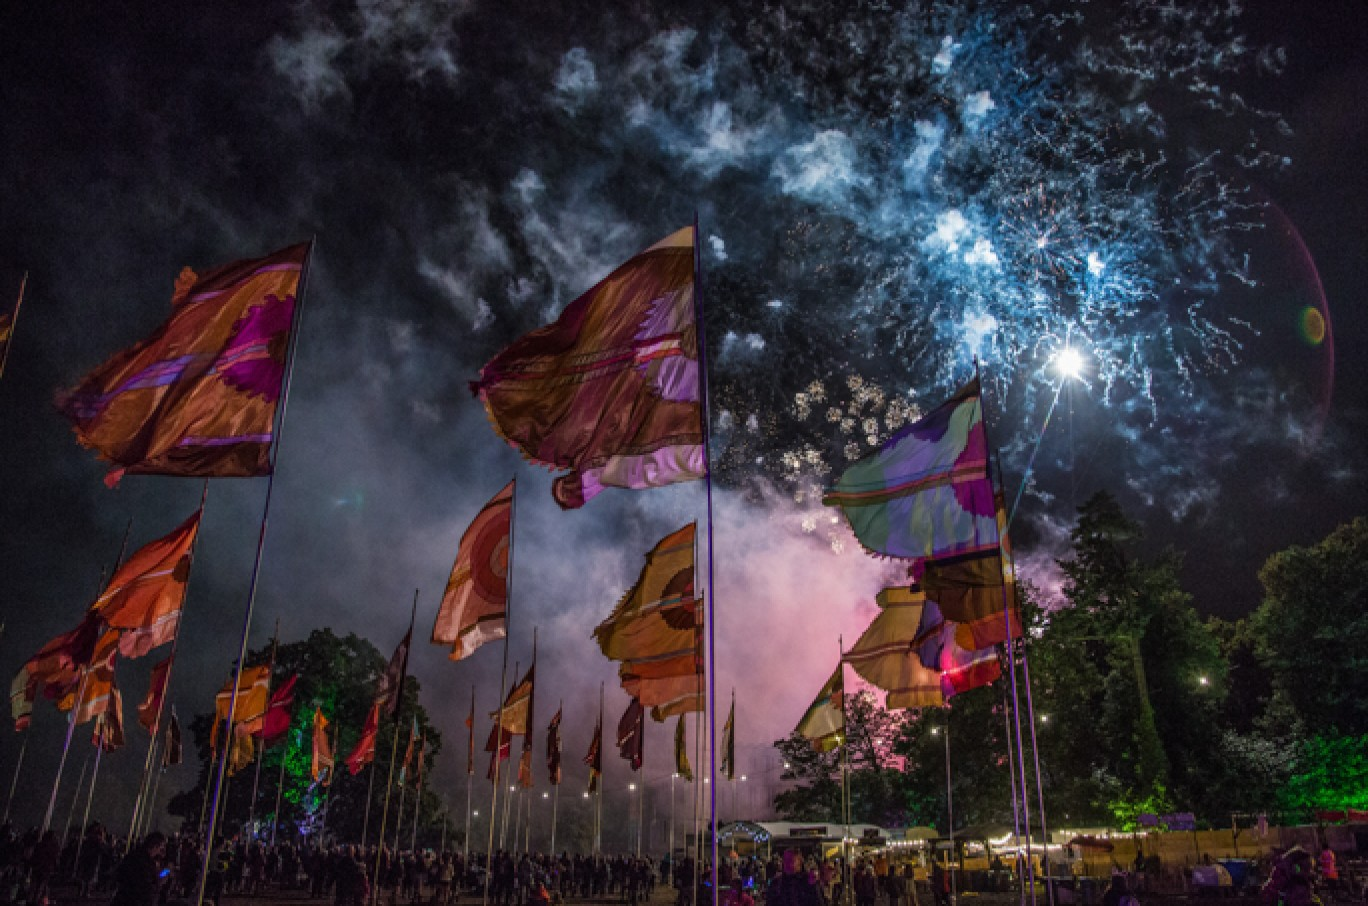 6_15-camp-bestival-2017-fireworks-aw-adam47661501584981